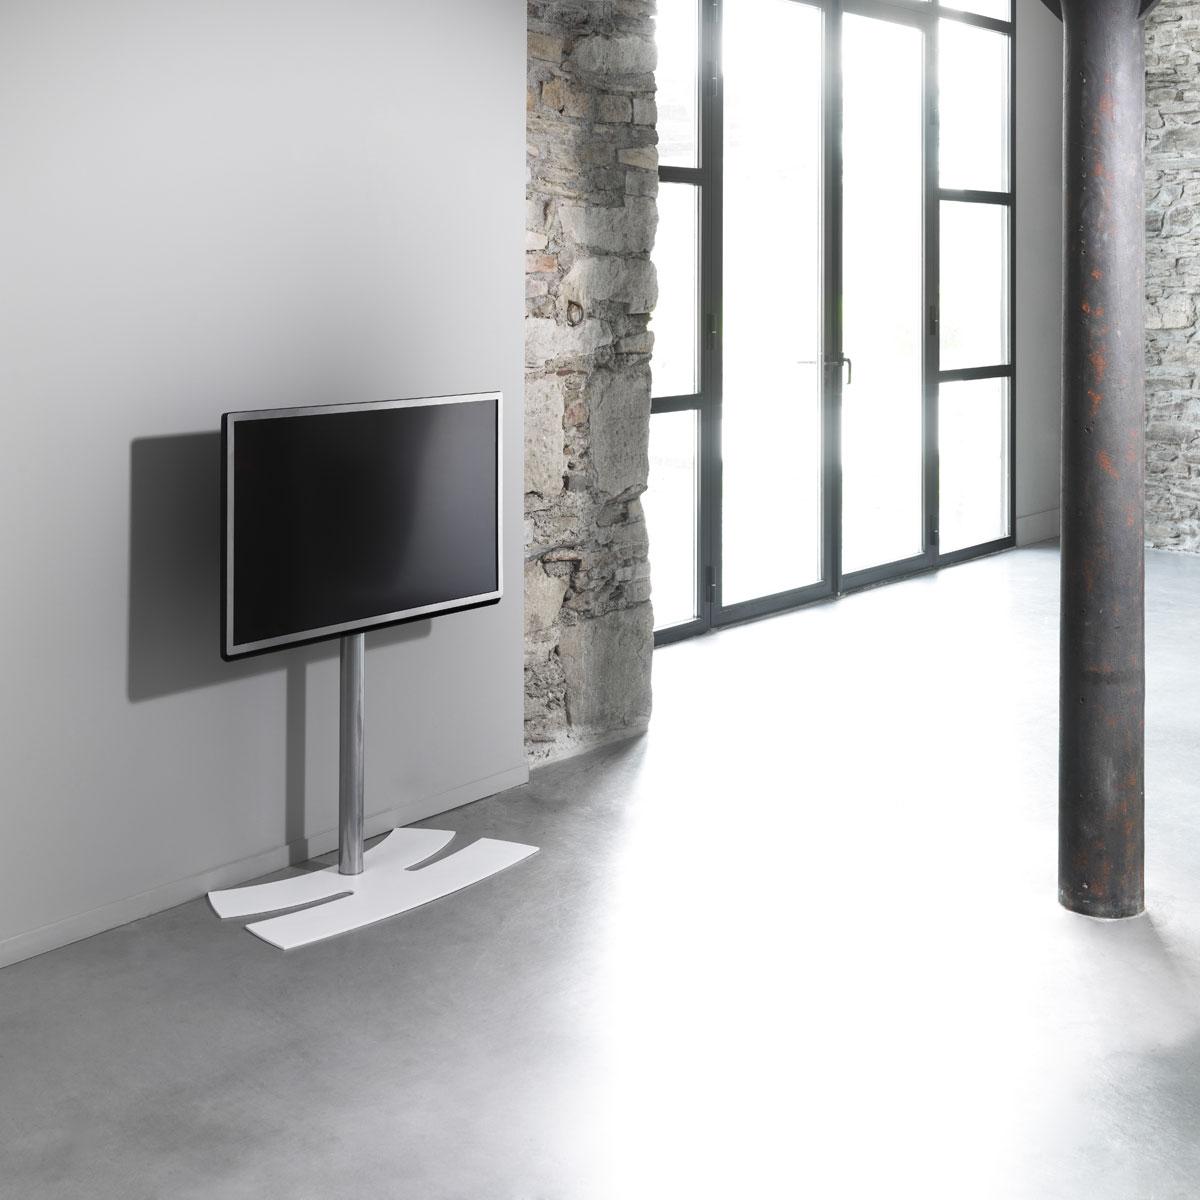 Erard Lux Up 1400xl Noir Support Mural Tv Erard Group Sur Ldlc Com # Meuble Tv Fixation Murale